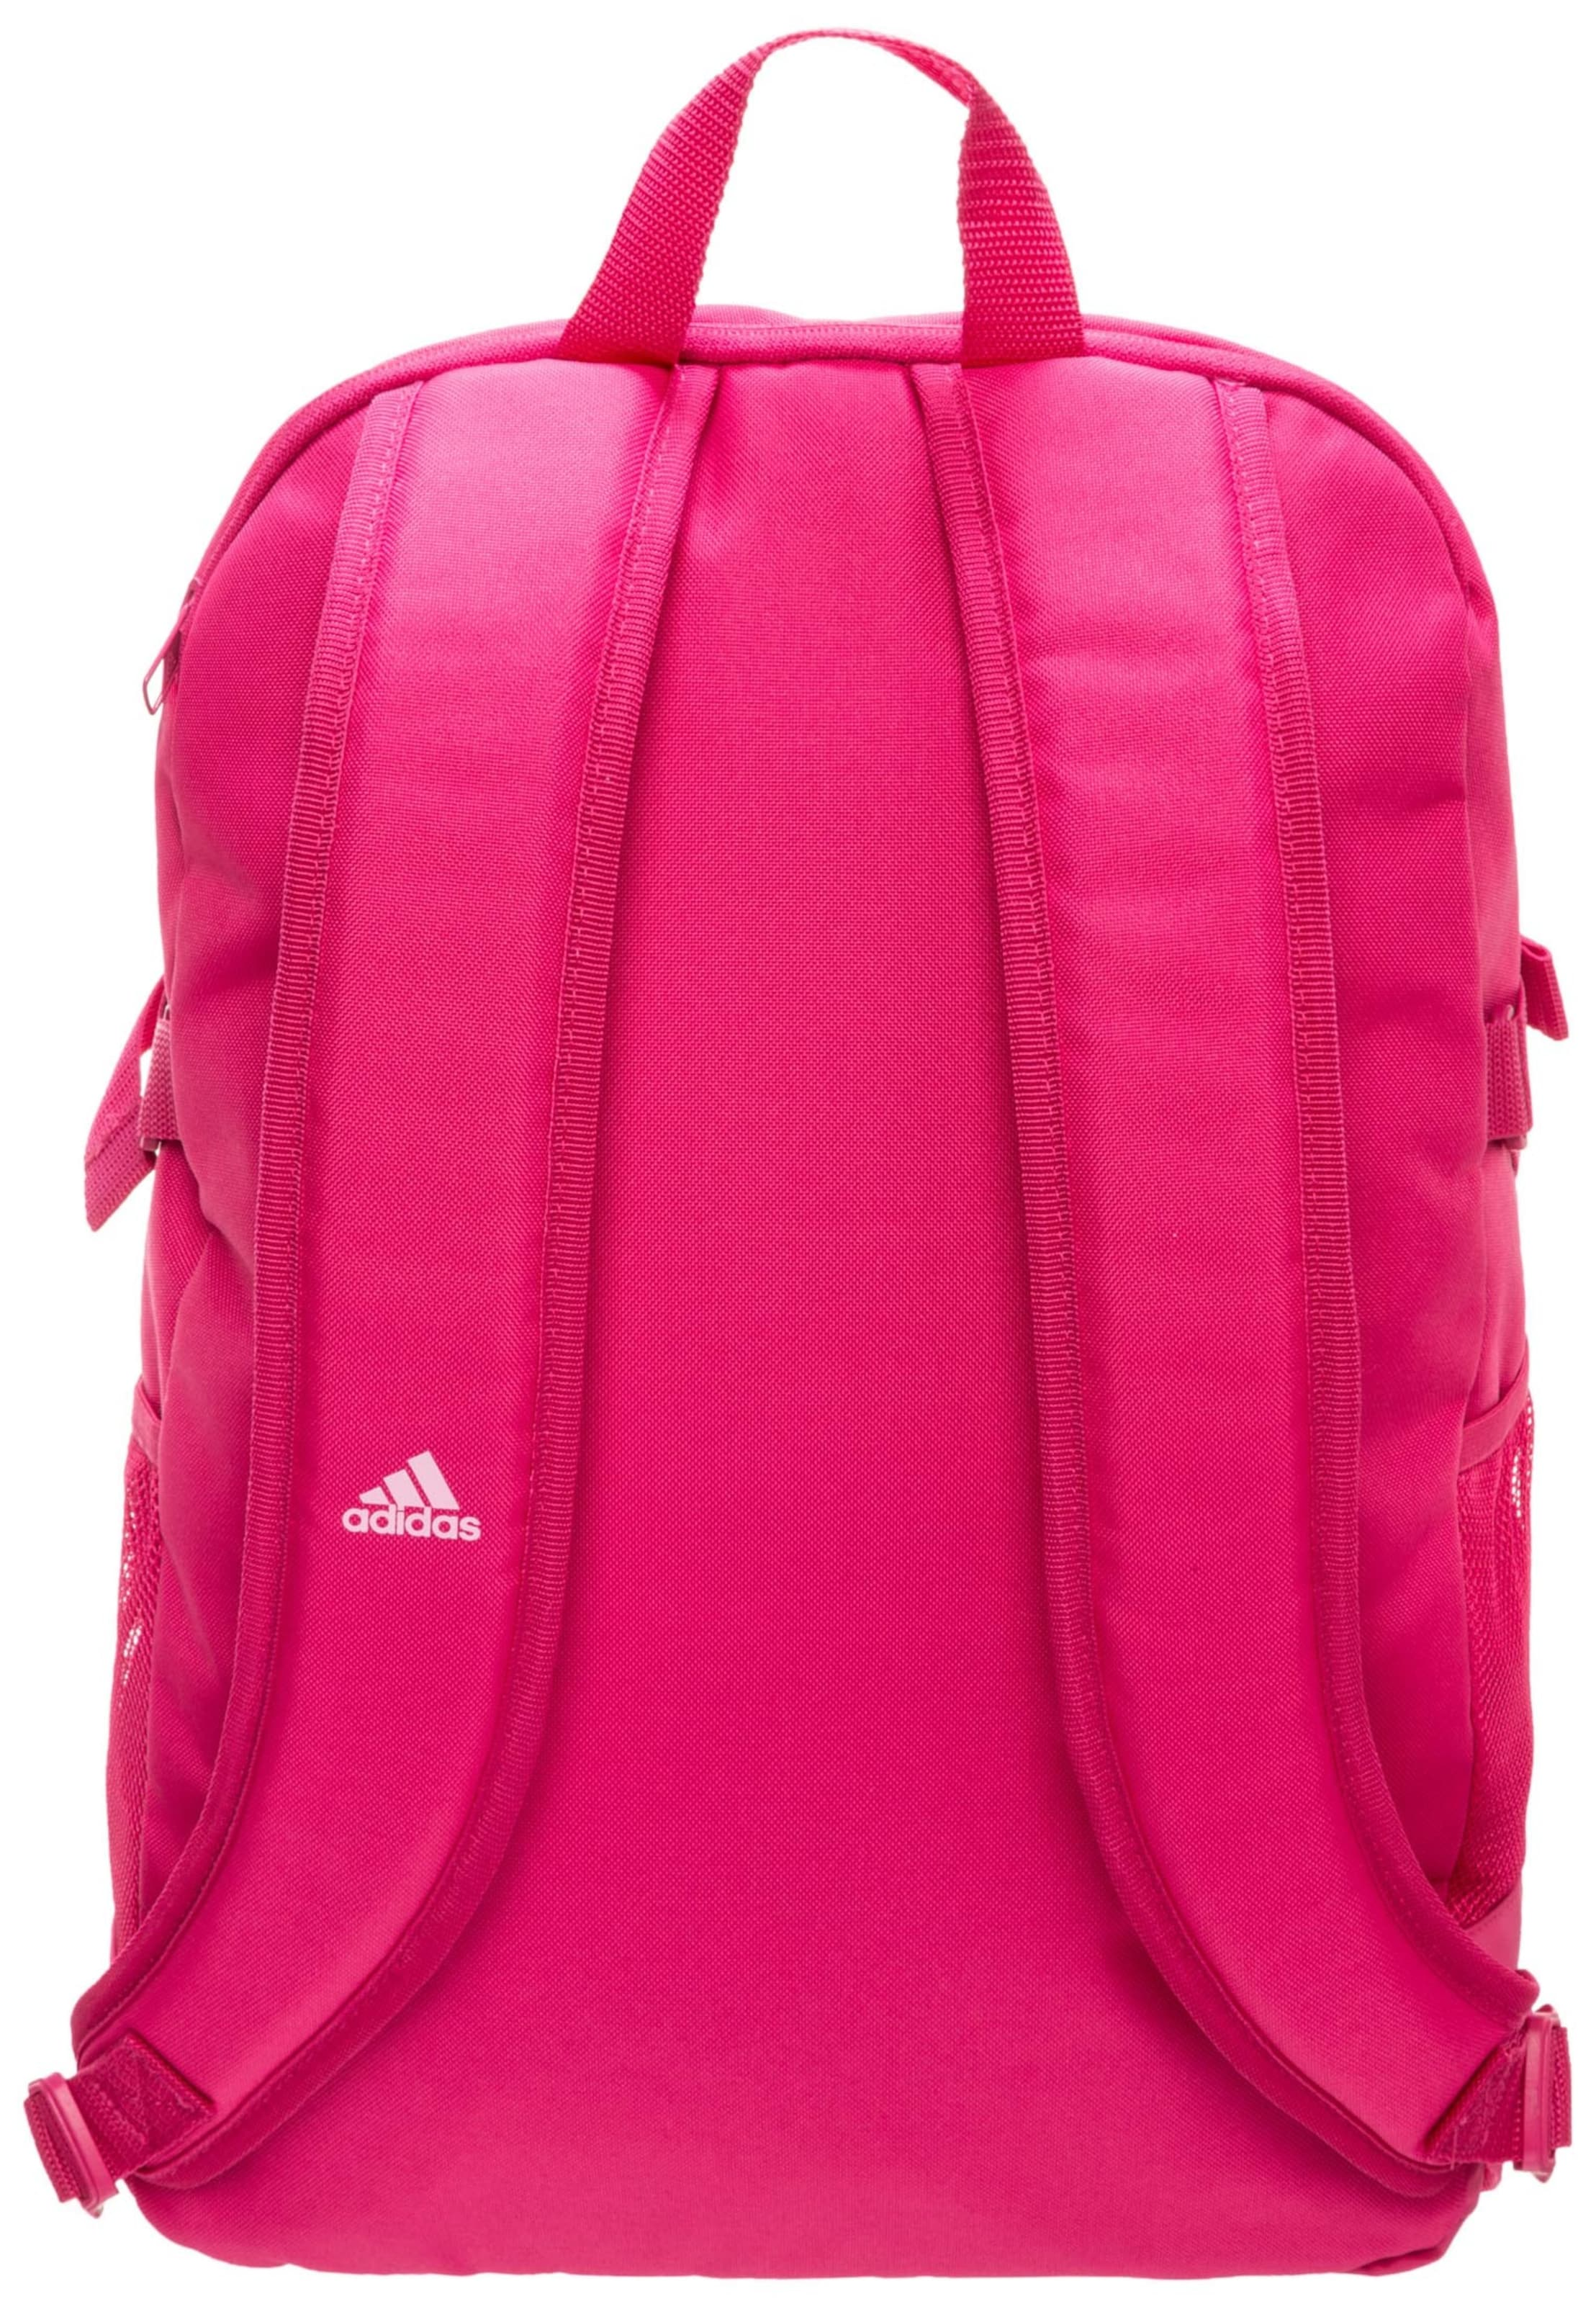 Performance Sportrucksack Adidas In 'power PinkRosa Iv' IE2HW9D